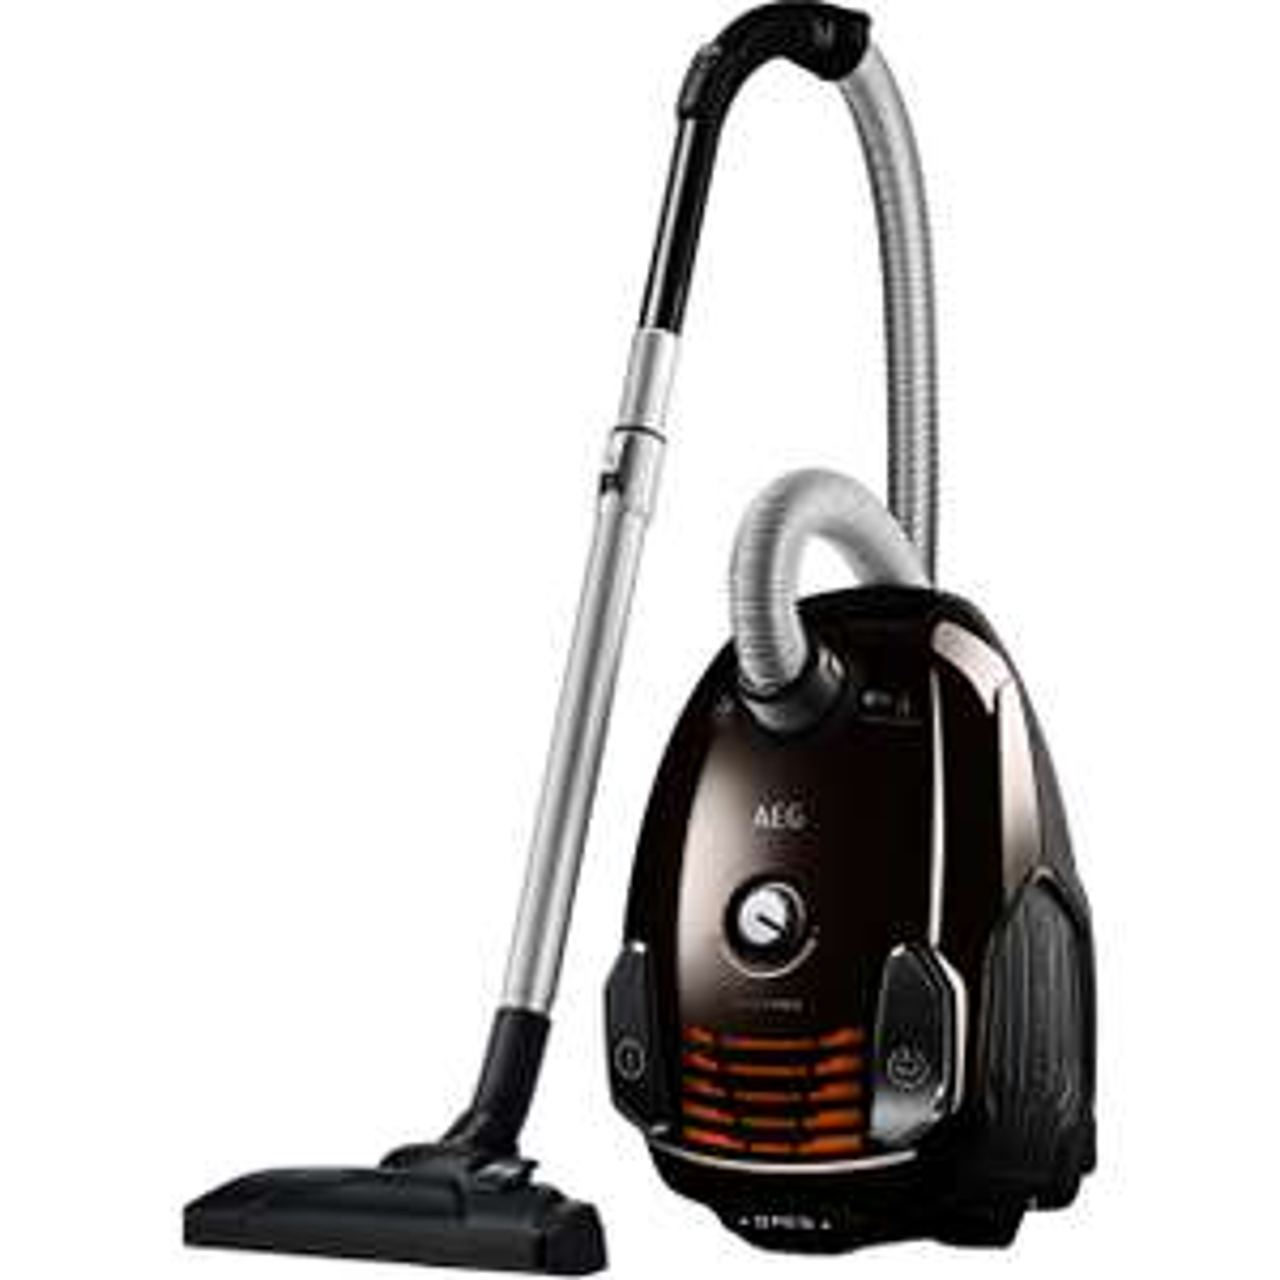 AEG VX6-2-CB-P Bagged Cylinder Vacuum Cleaner - £99 @ AO